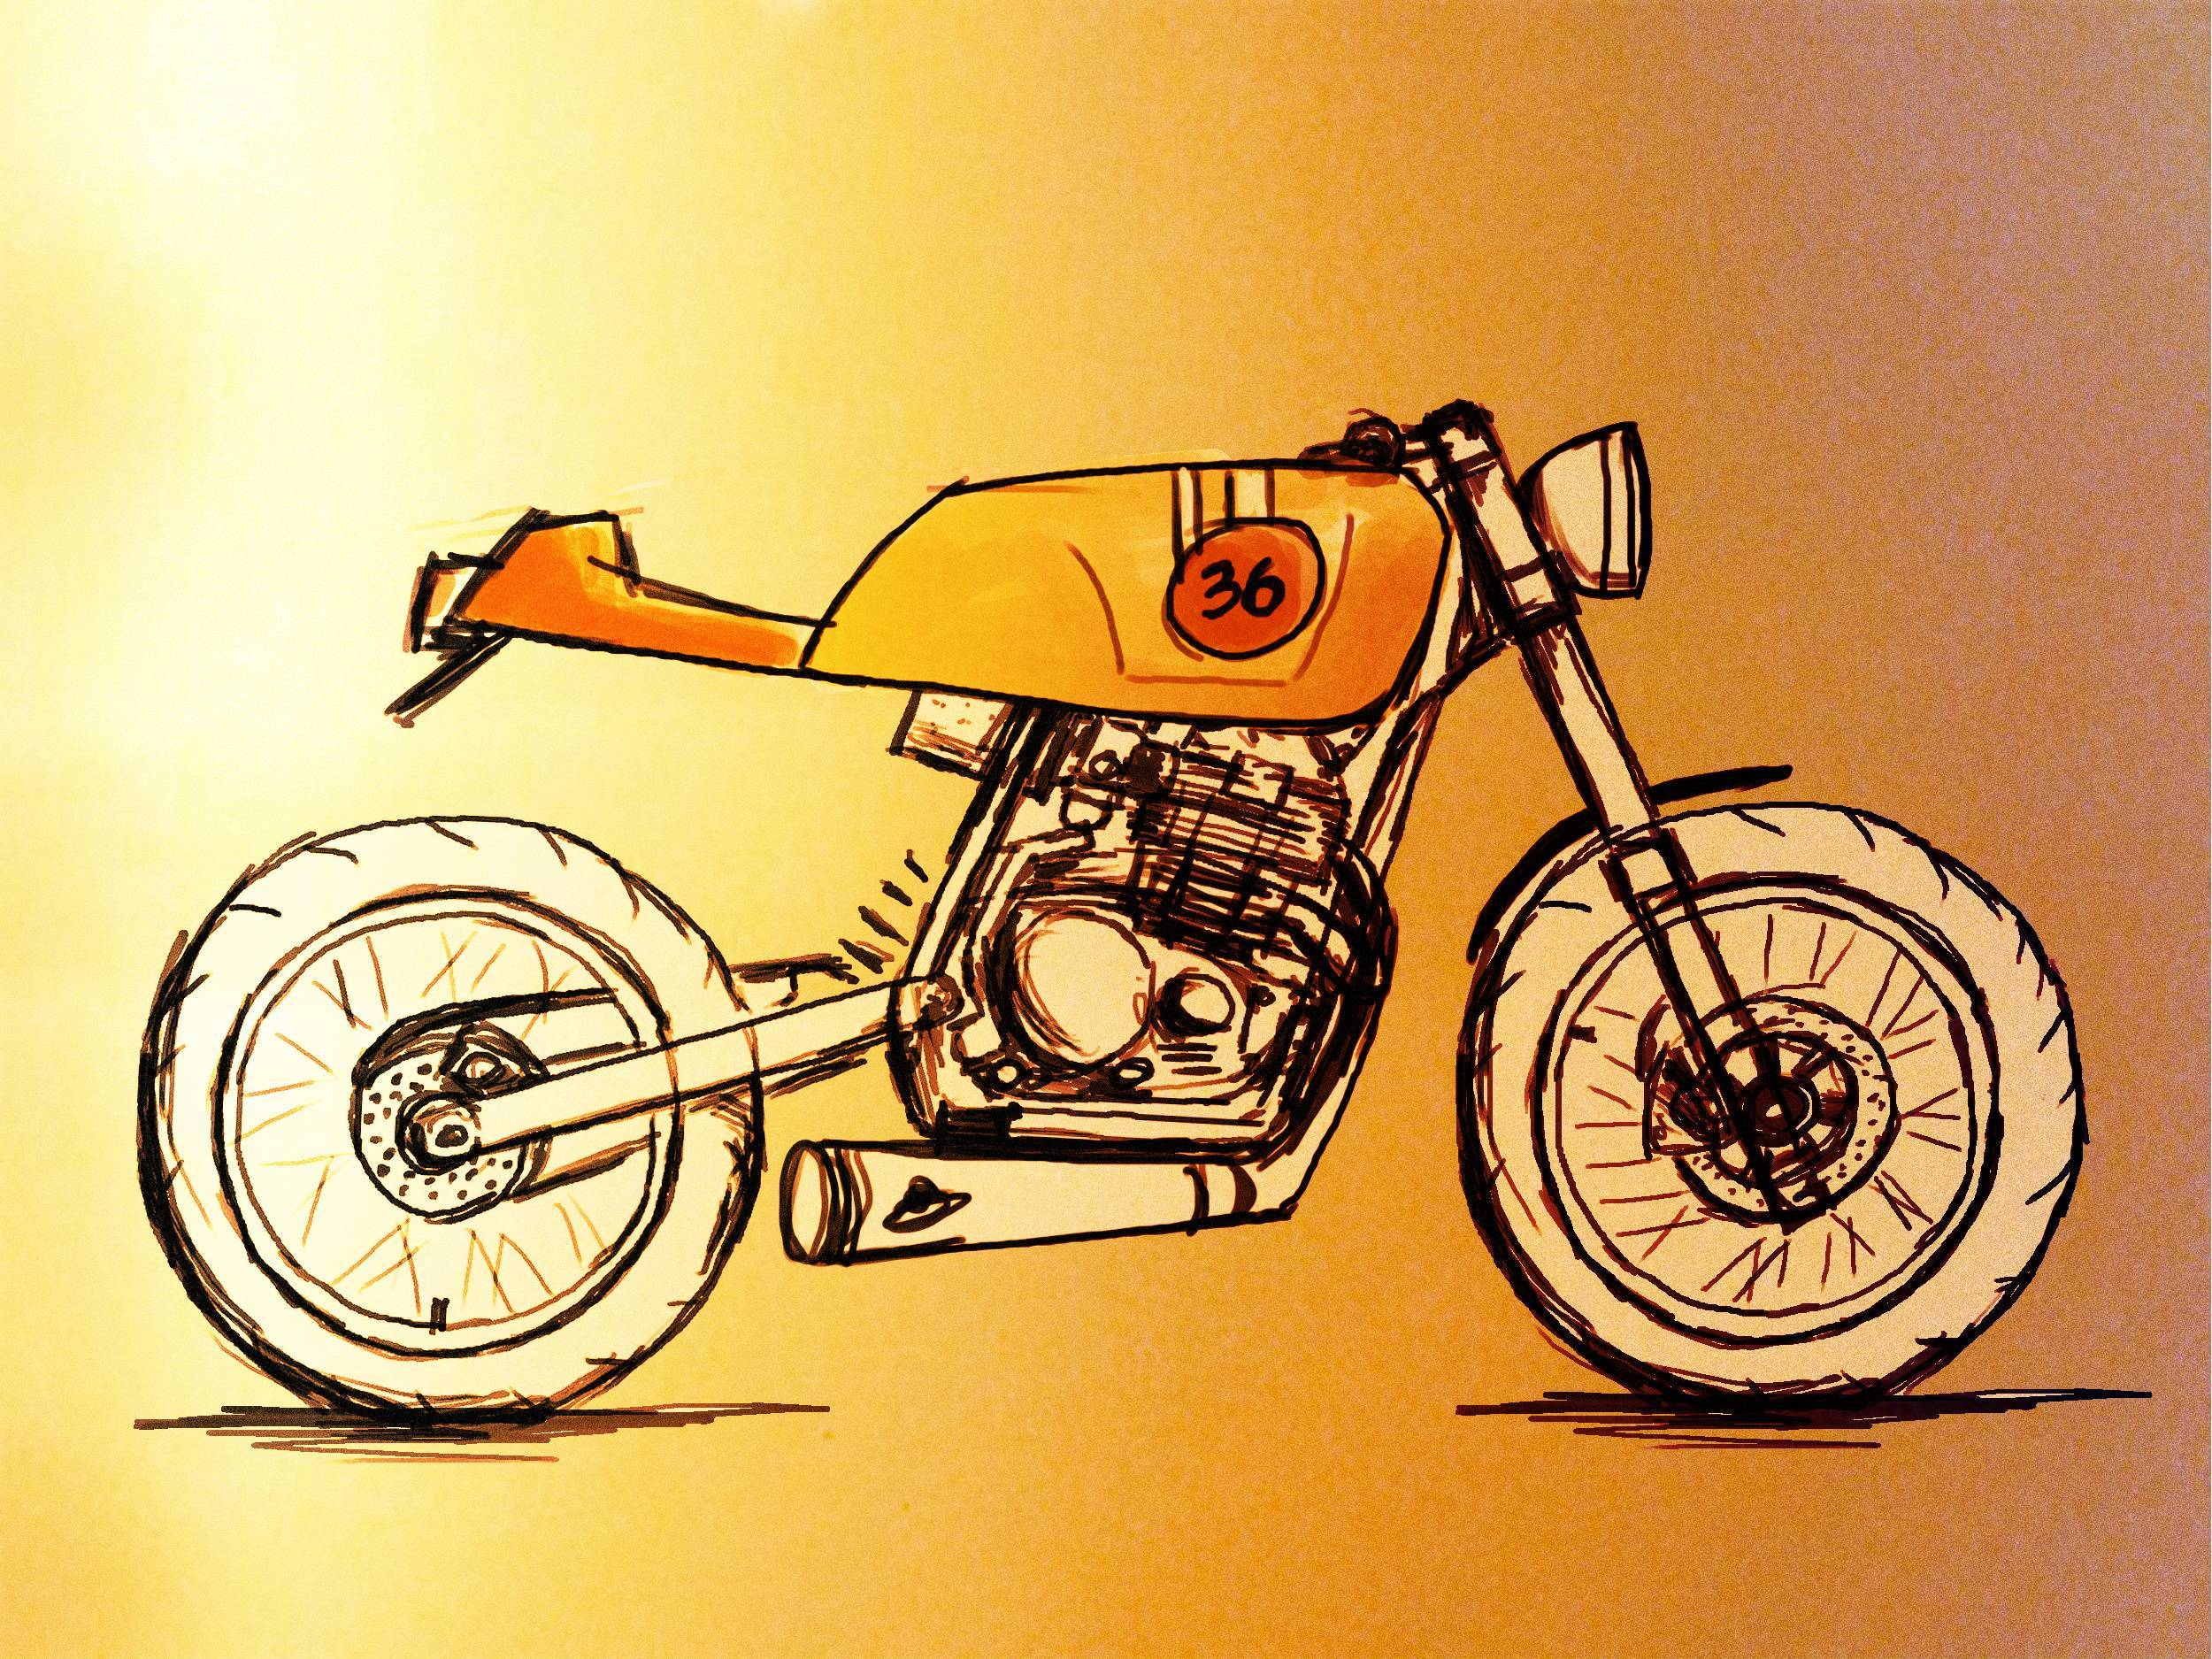 Cafe Racer Wallpapers Wallpaper Cave Cafe Racer Bike Sketch 262861 Hd Wallpaper Backgrounds Download